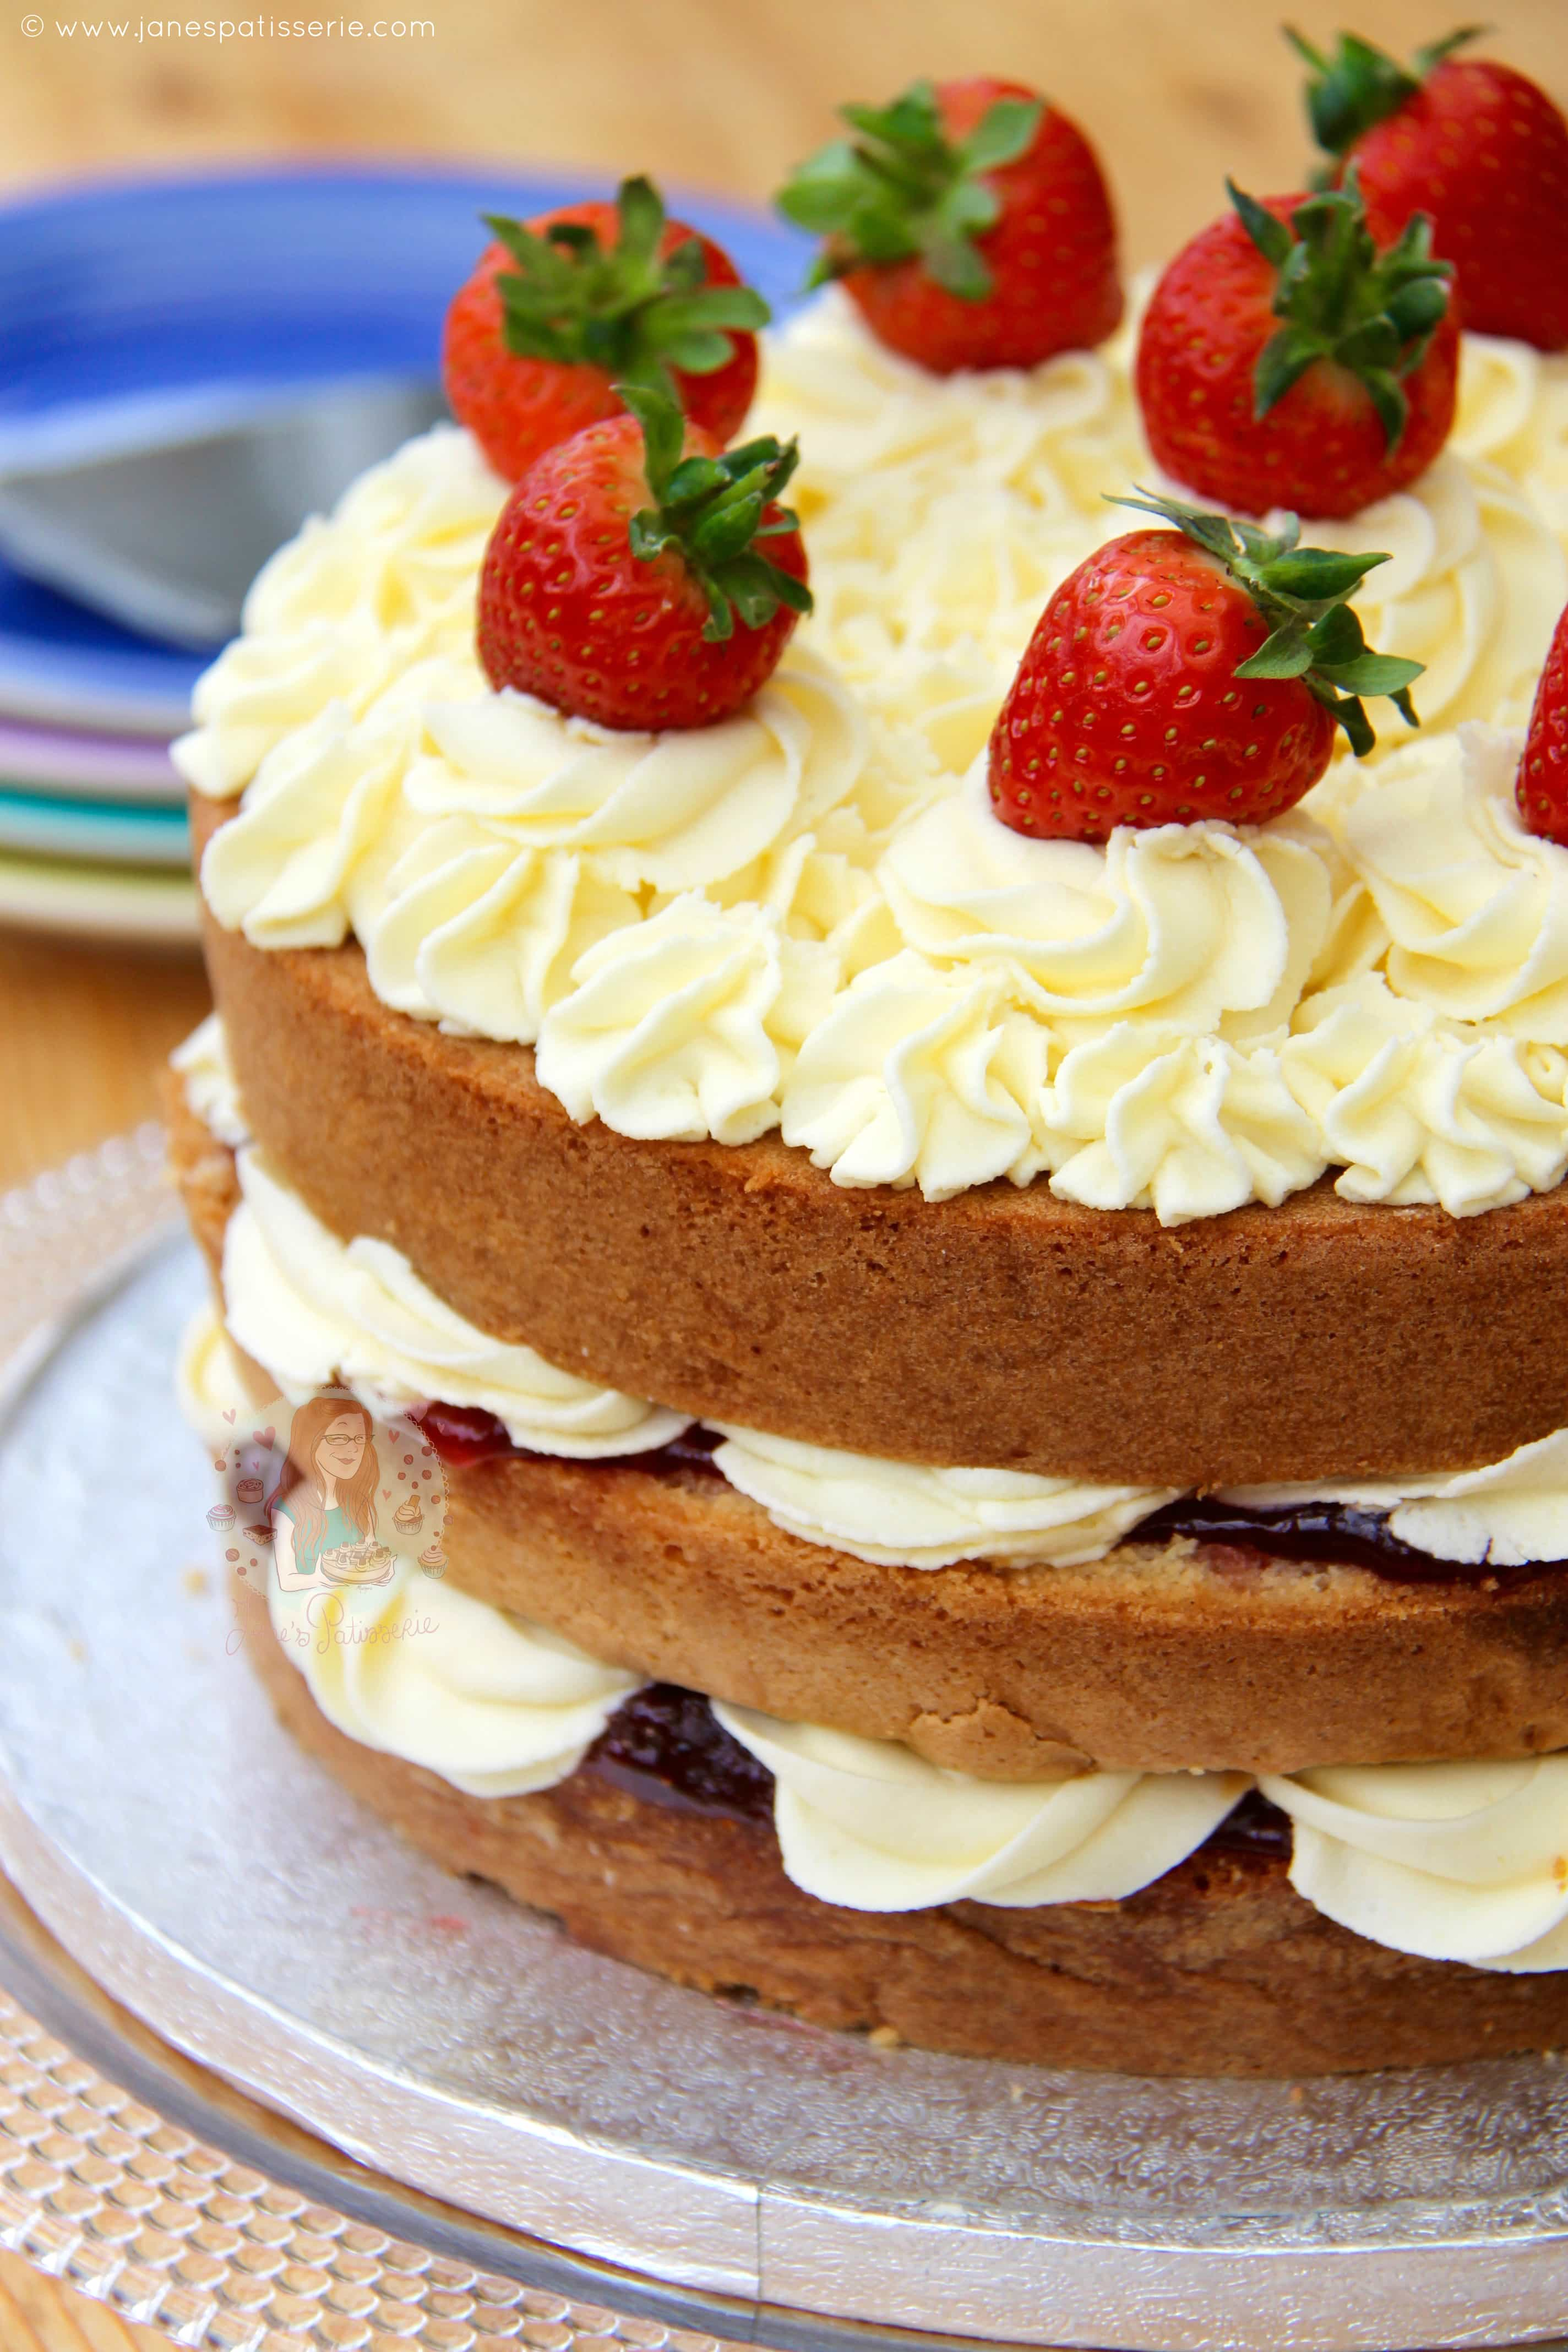 How To Buttercream All Over A Celebration Sponge Cake